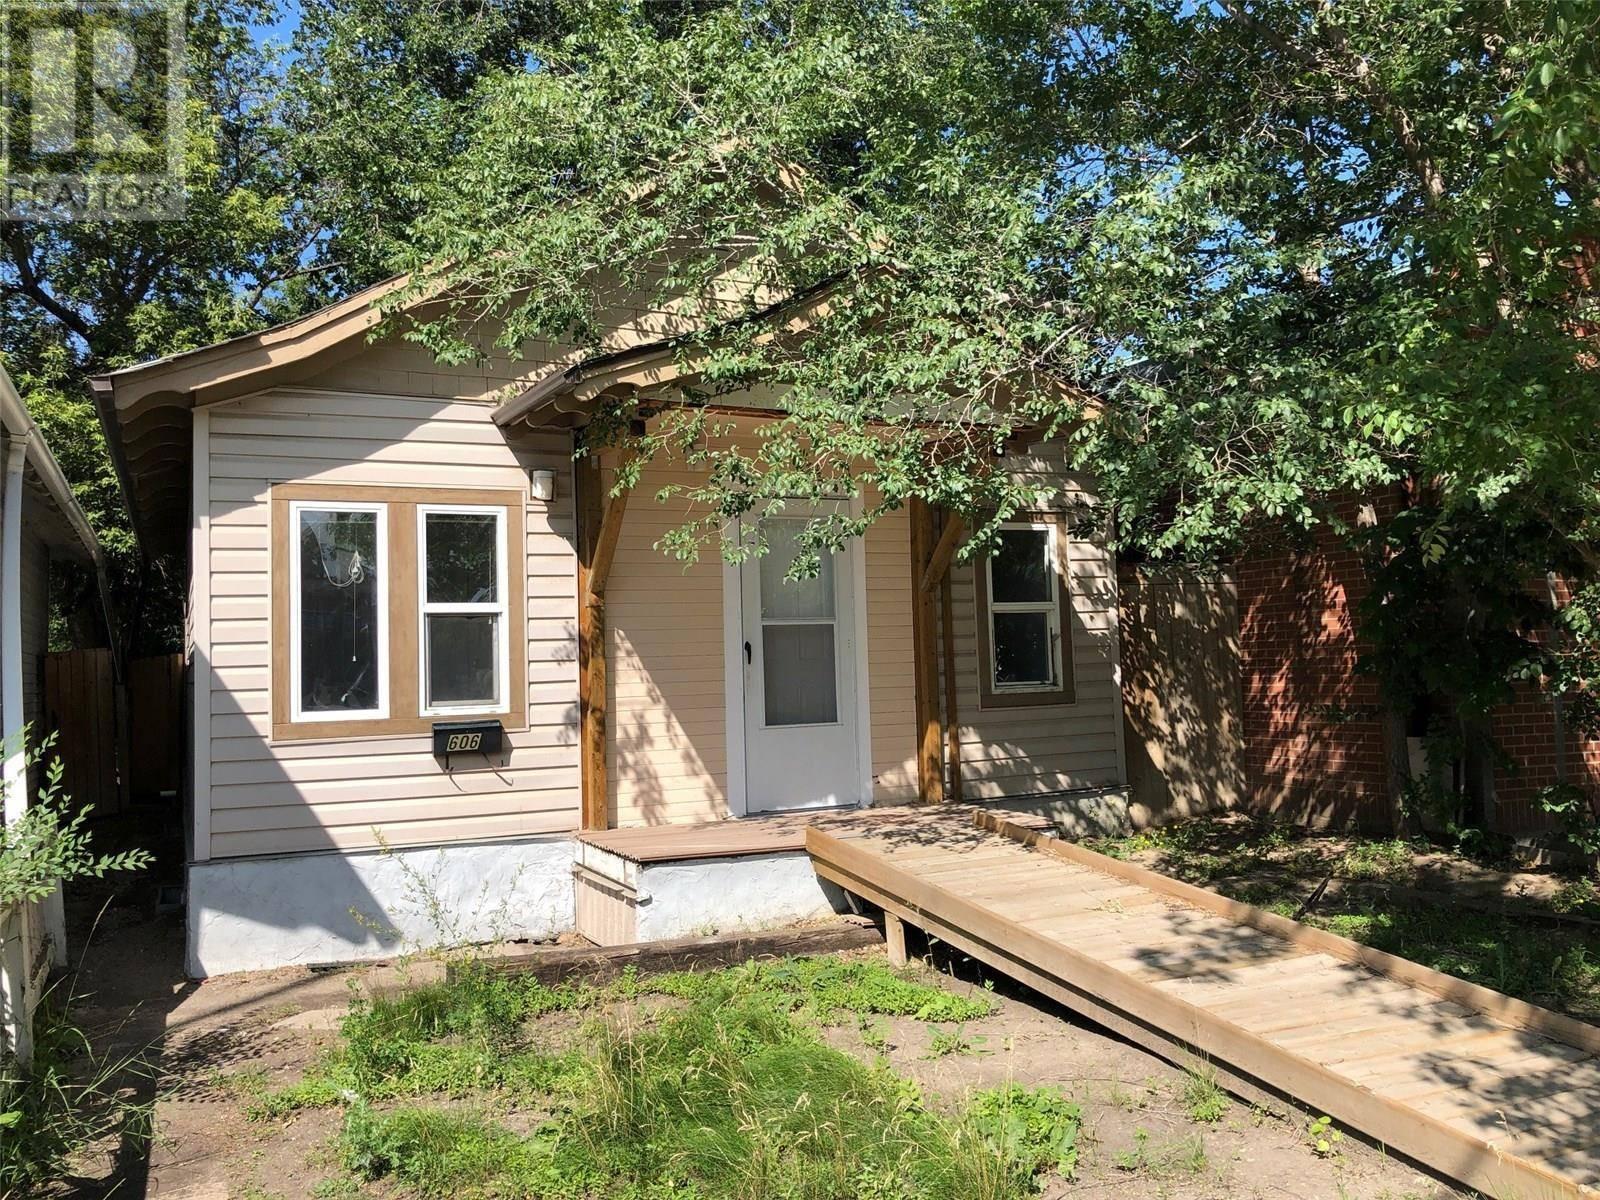 House for sale at 606 33rd St W Saskatoon Saskatchewan - MLS: SK783532